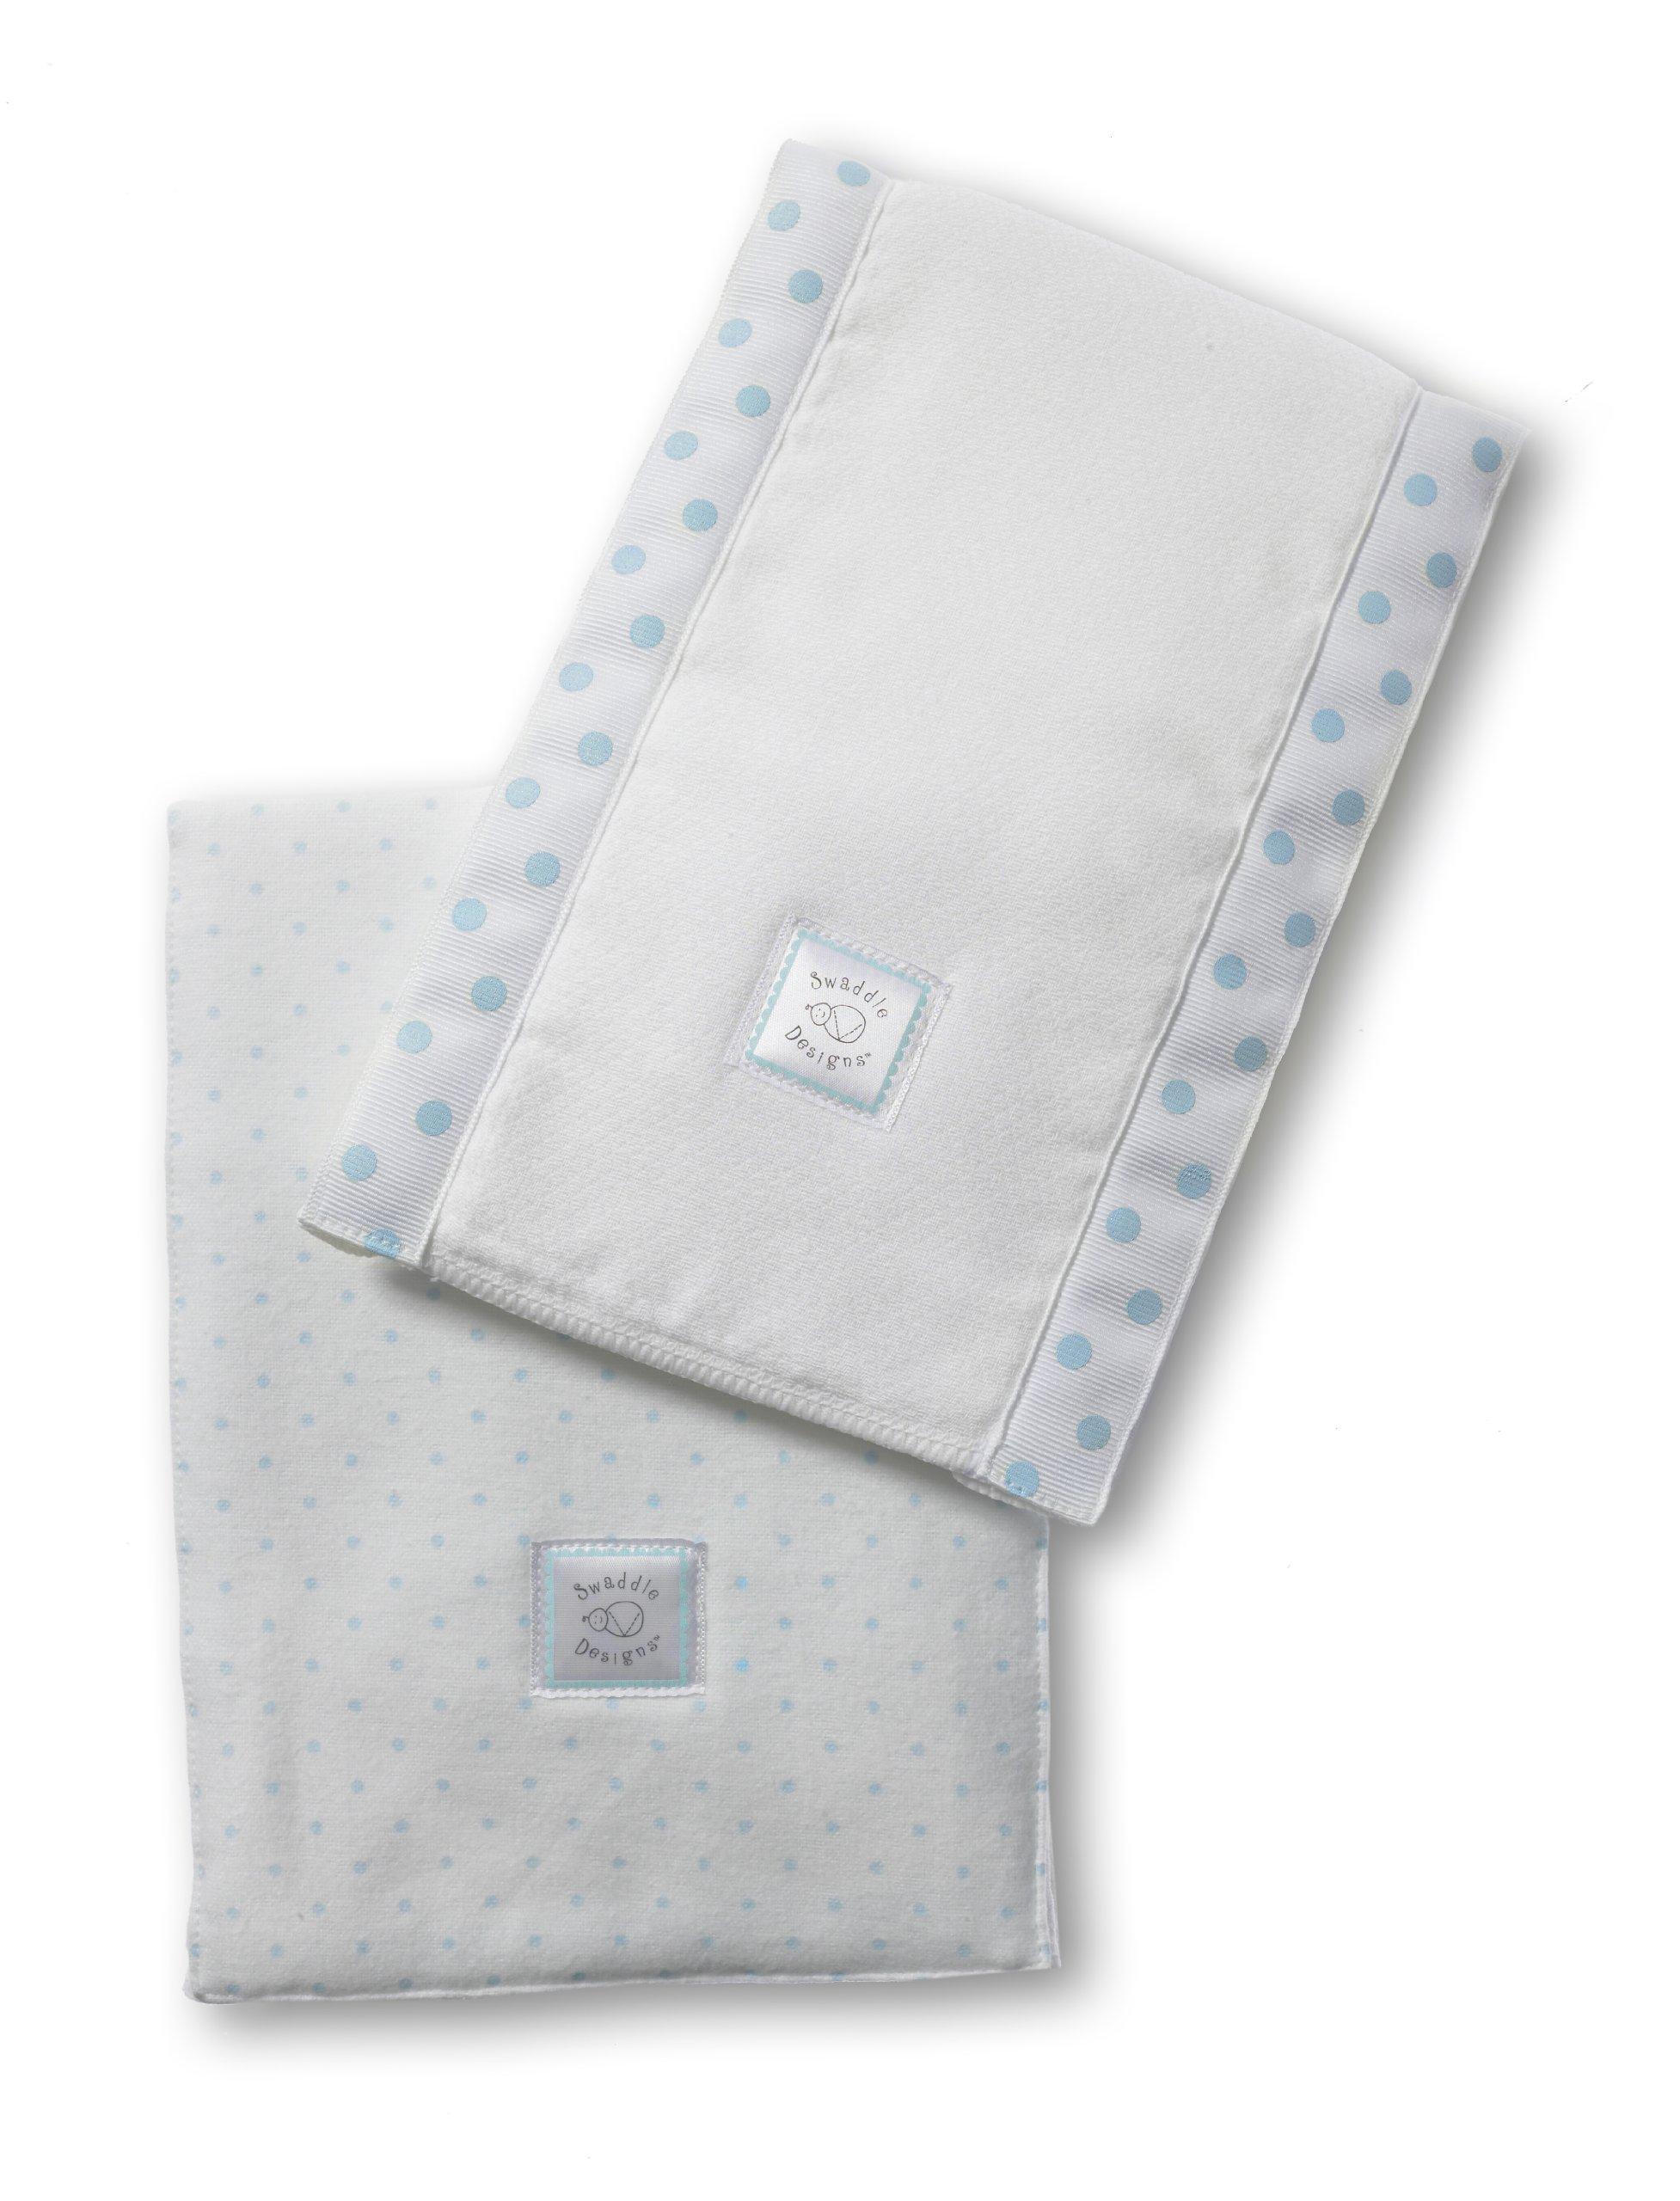 SwaddleDesigns Baby Burpies, Set of 2 Cotton Burp Cloths, Pastel Blue Polka Dots